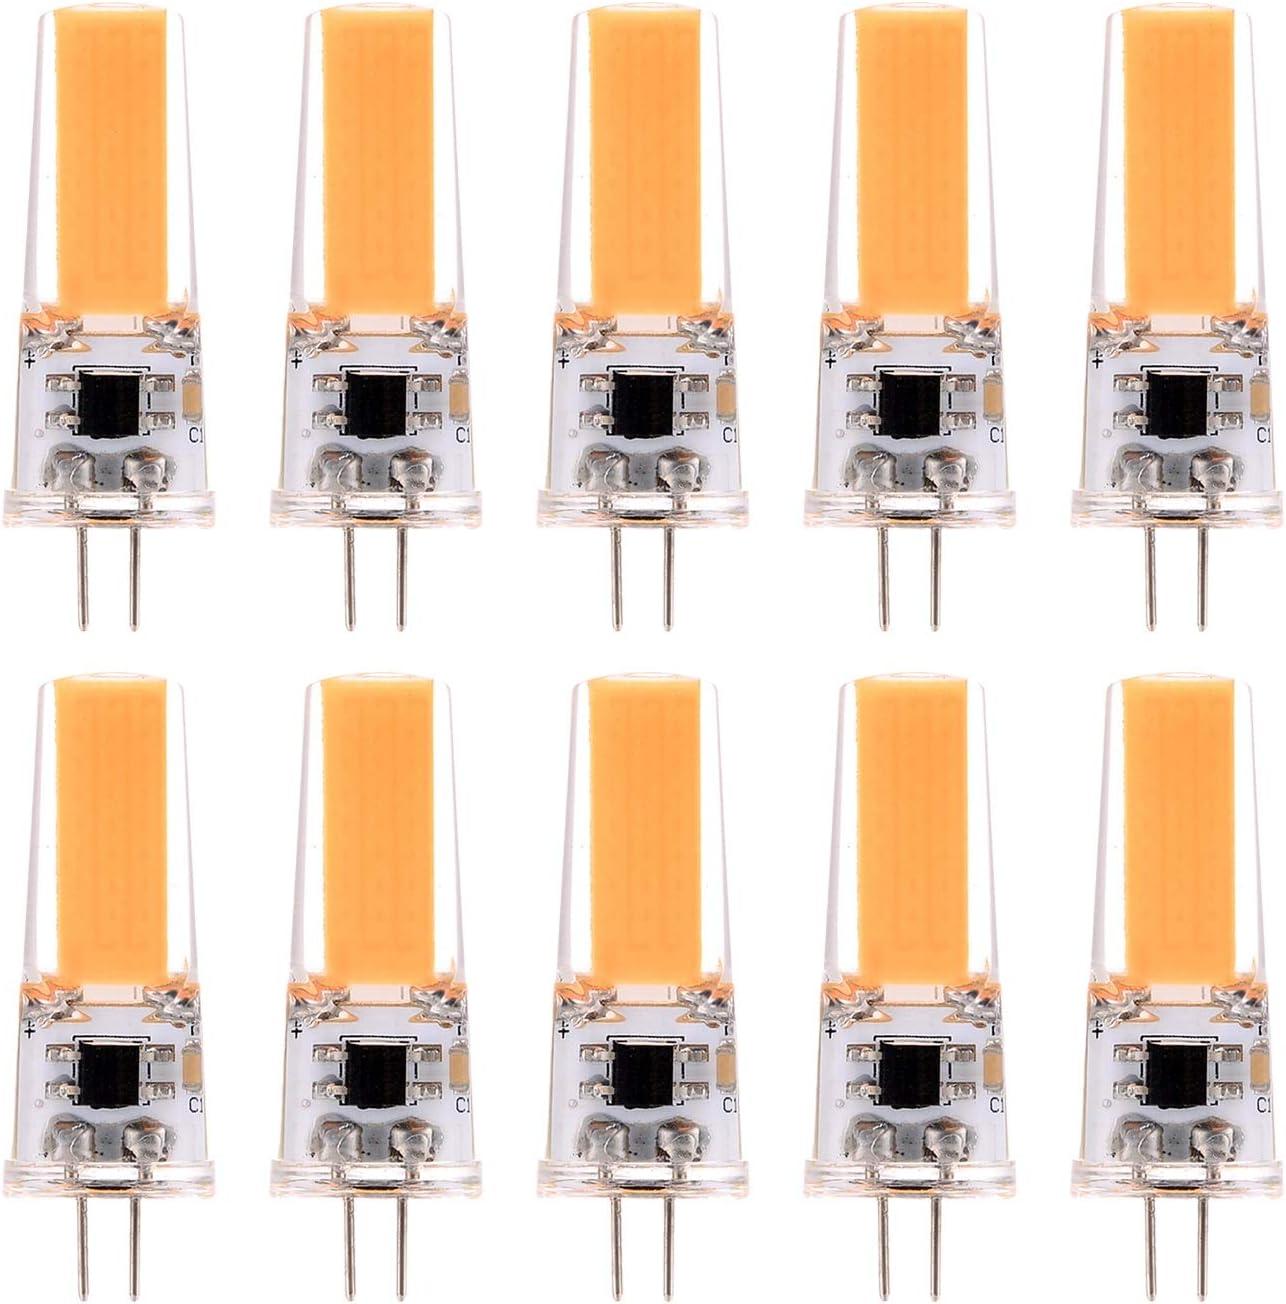 Liyuzhu G4 Max 54% OFF LED Bulb Double Needle 3W Energy Lamp Saving Mesa Mall COB